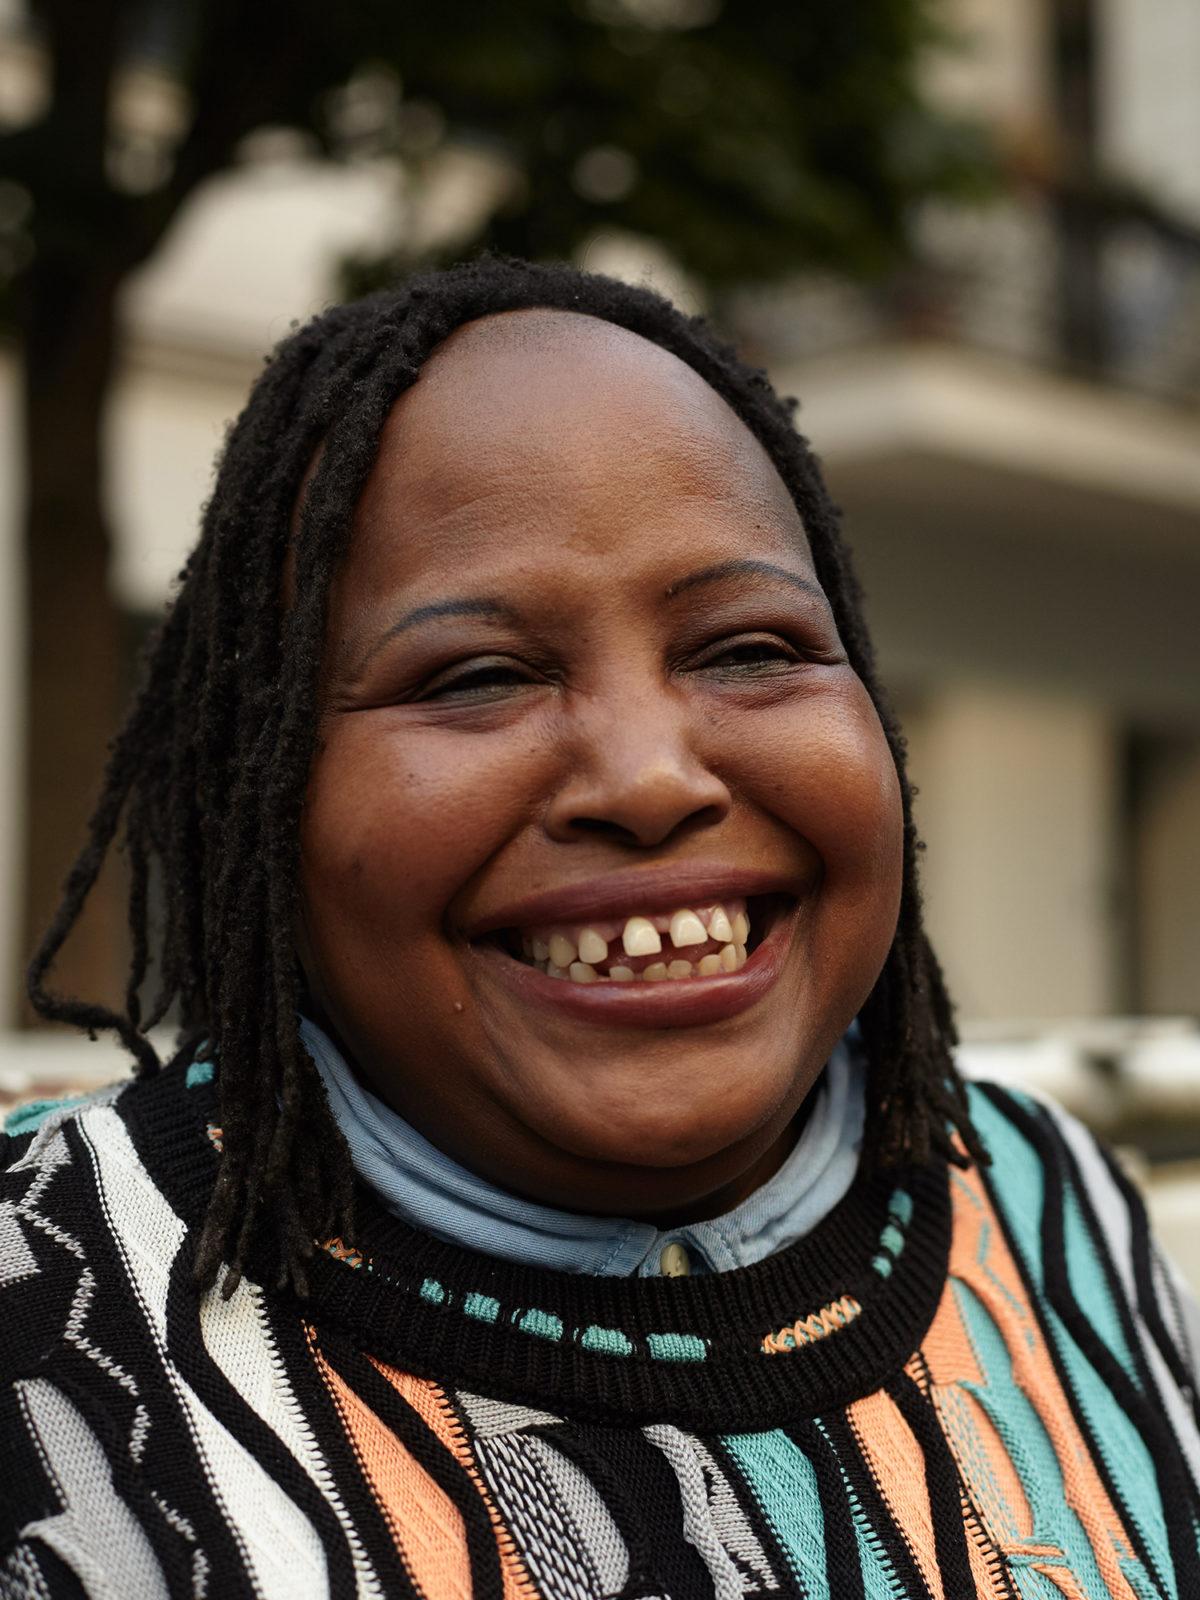 WOMEN WHO CREATE: MIXING BOUNDLESSNESS WITH LERATO KHATHI